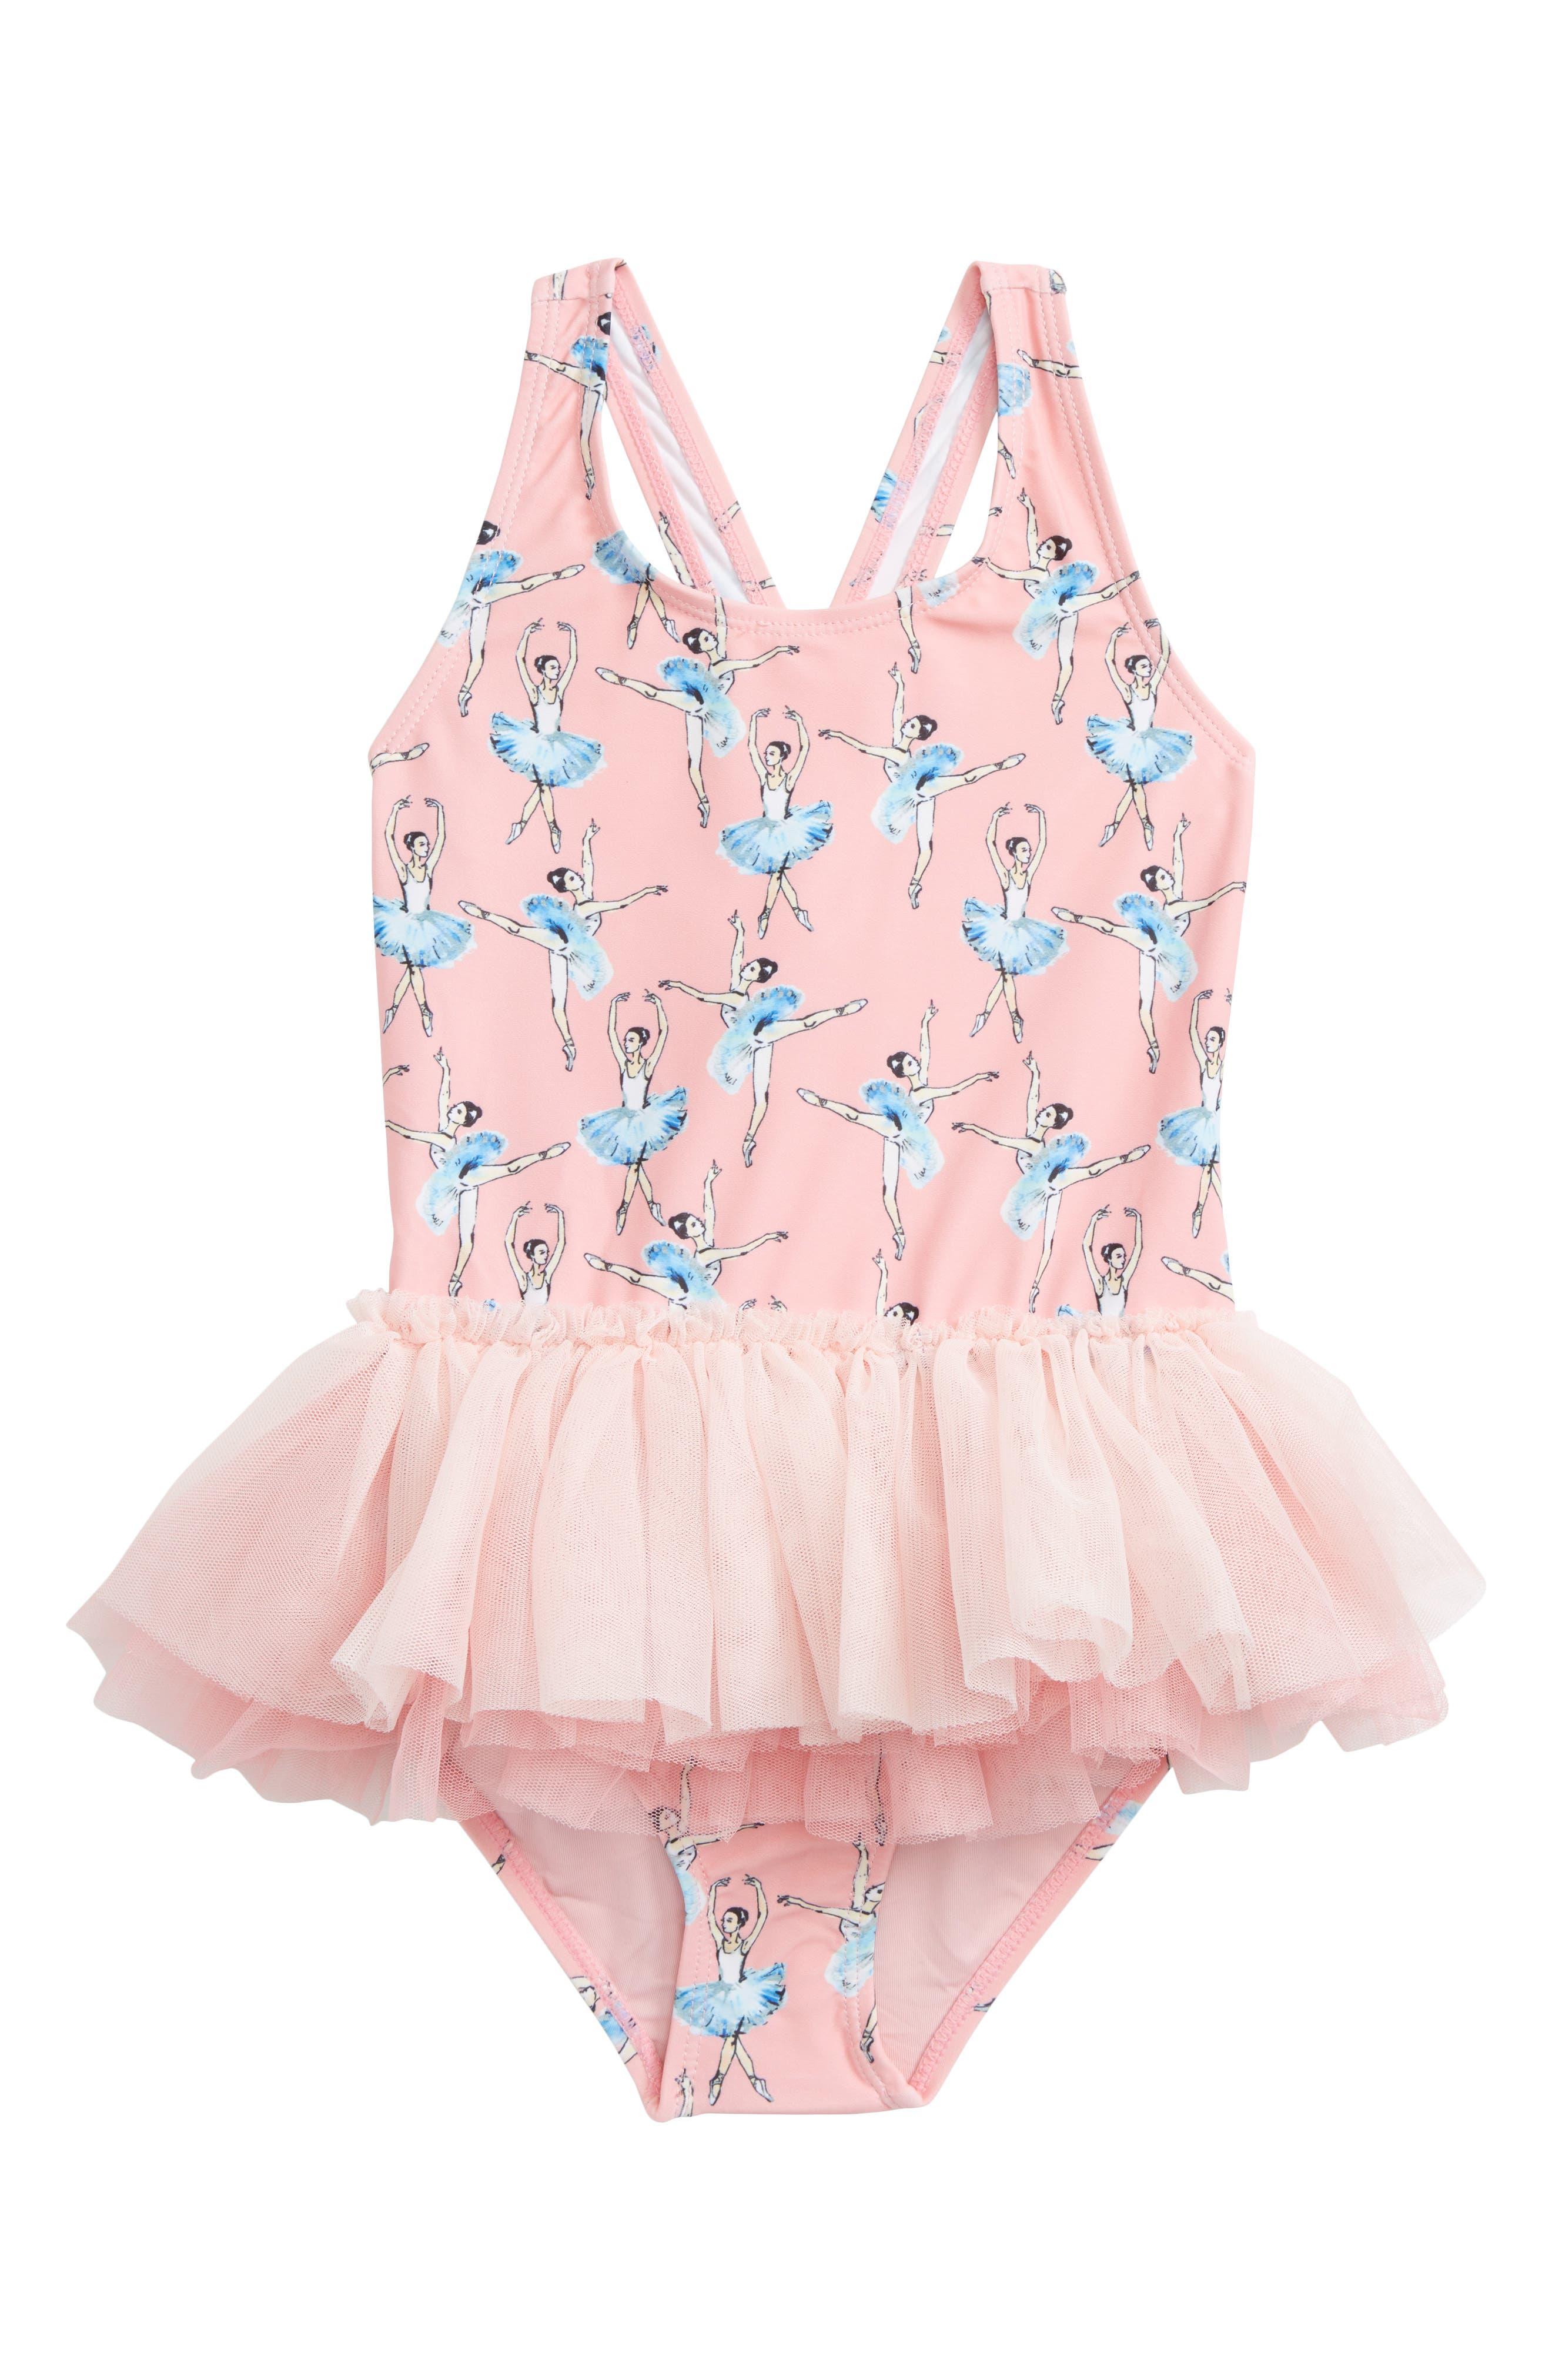 Main Image - Rock Your Kid Basque Ballerinas One-Piece Swimsuit (Toddler Girls & Little Girls)